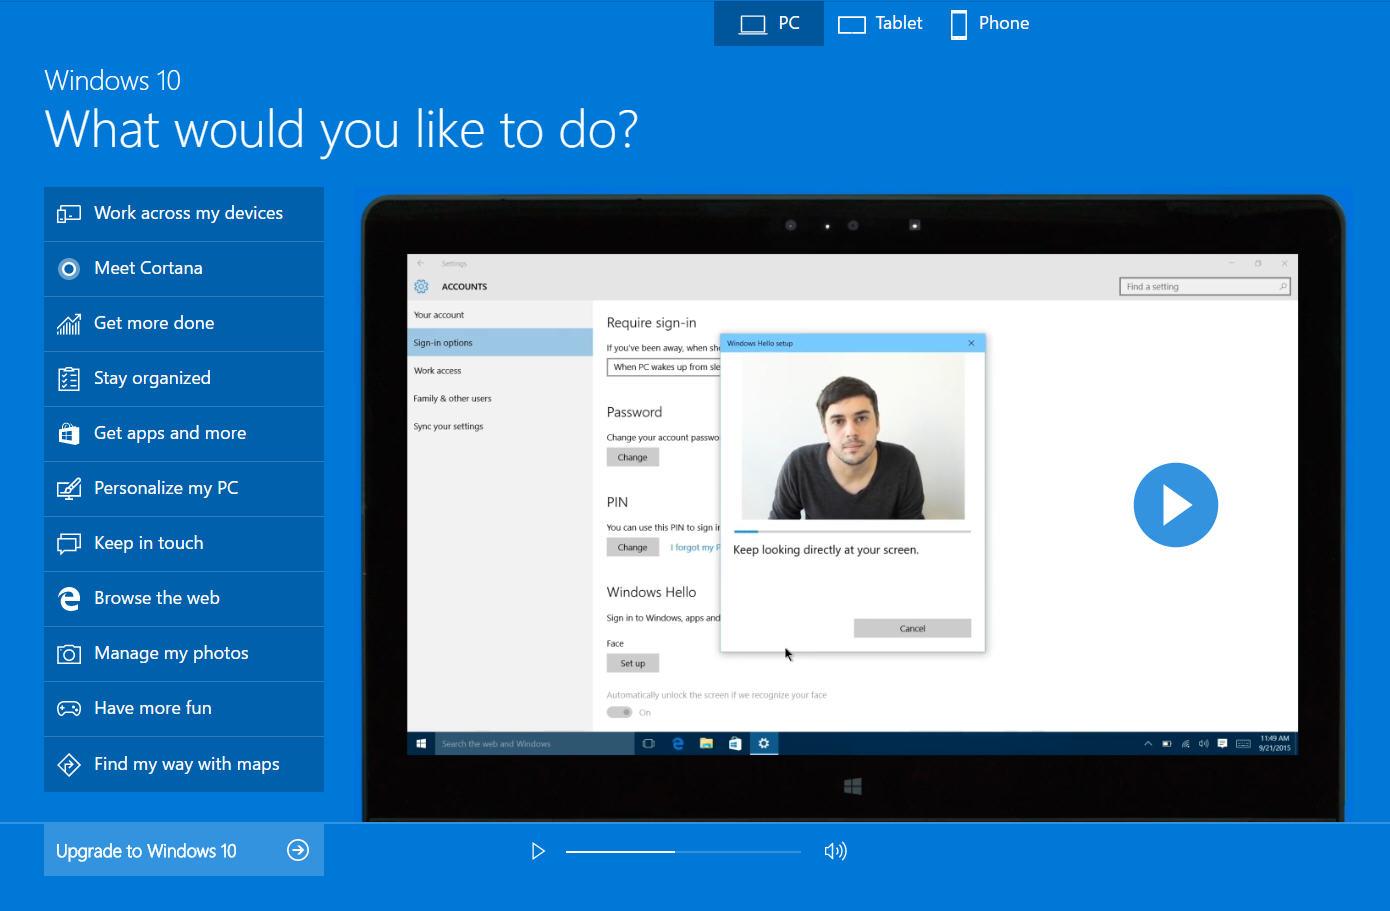 Windows 10 demo